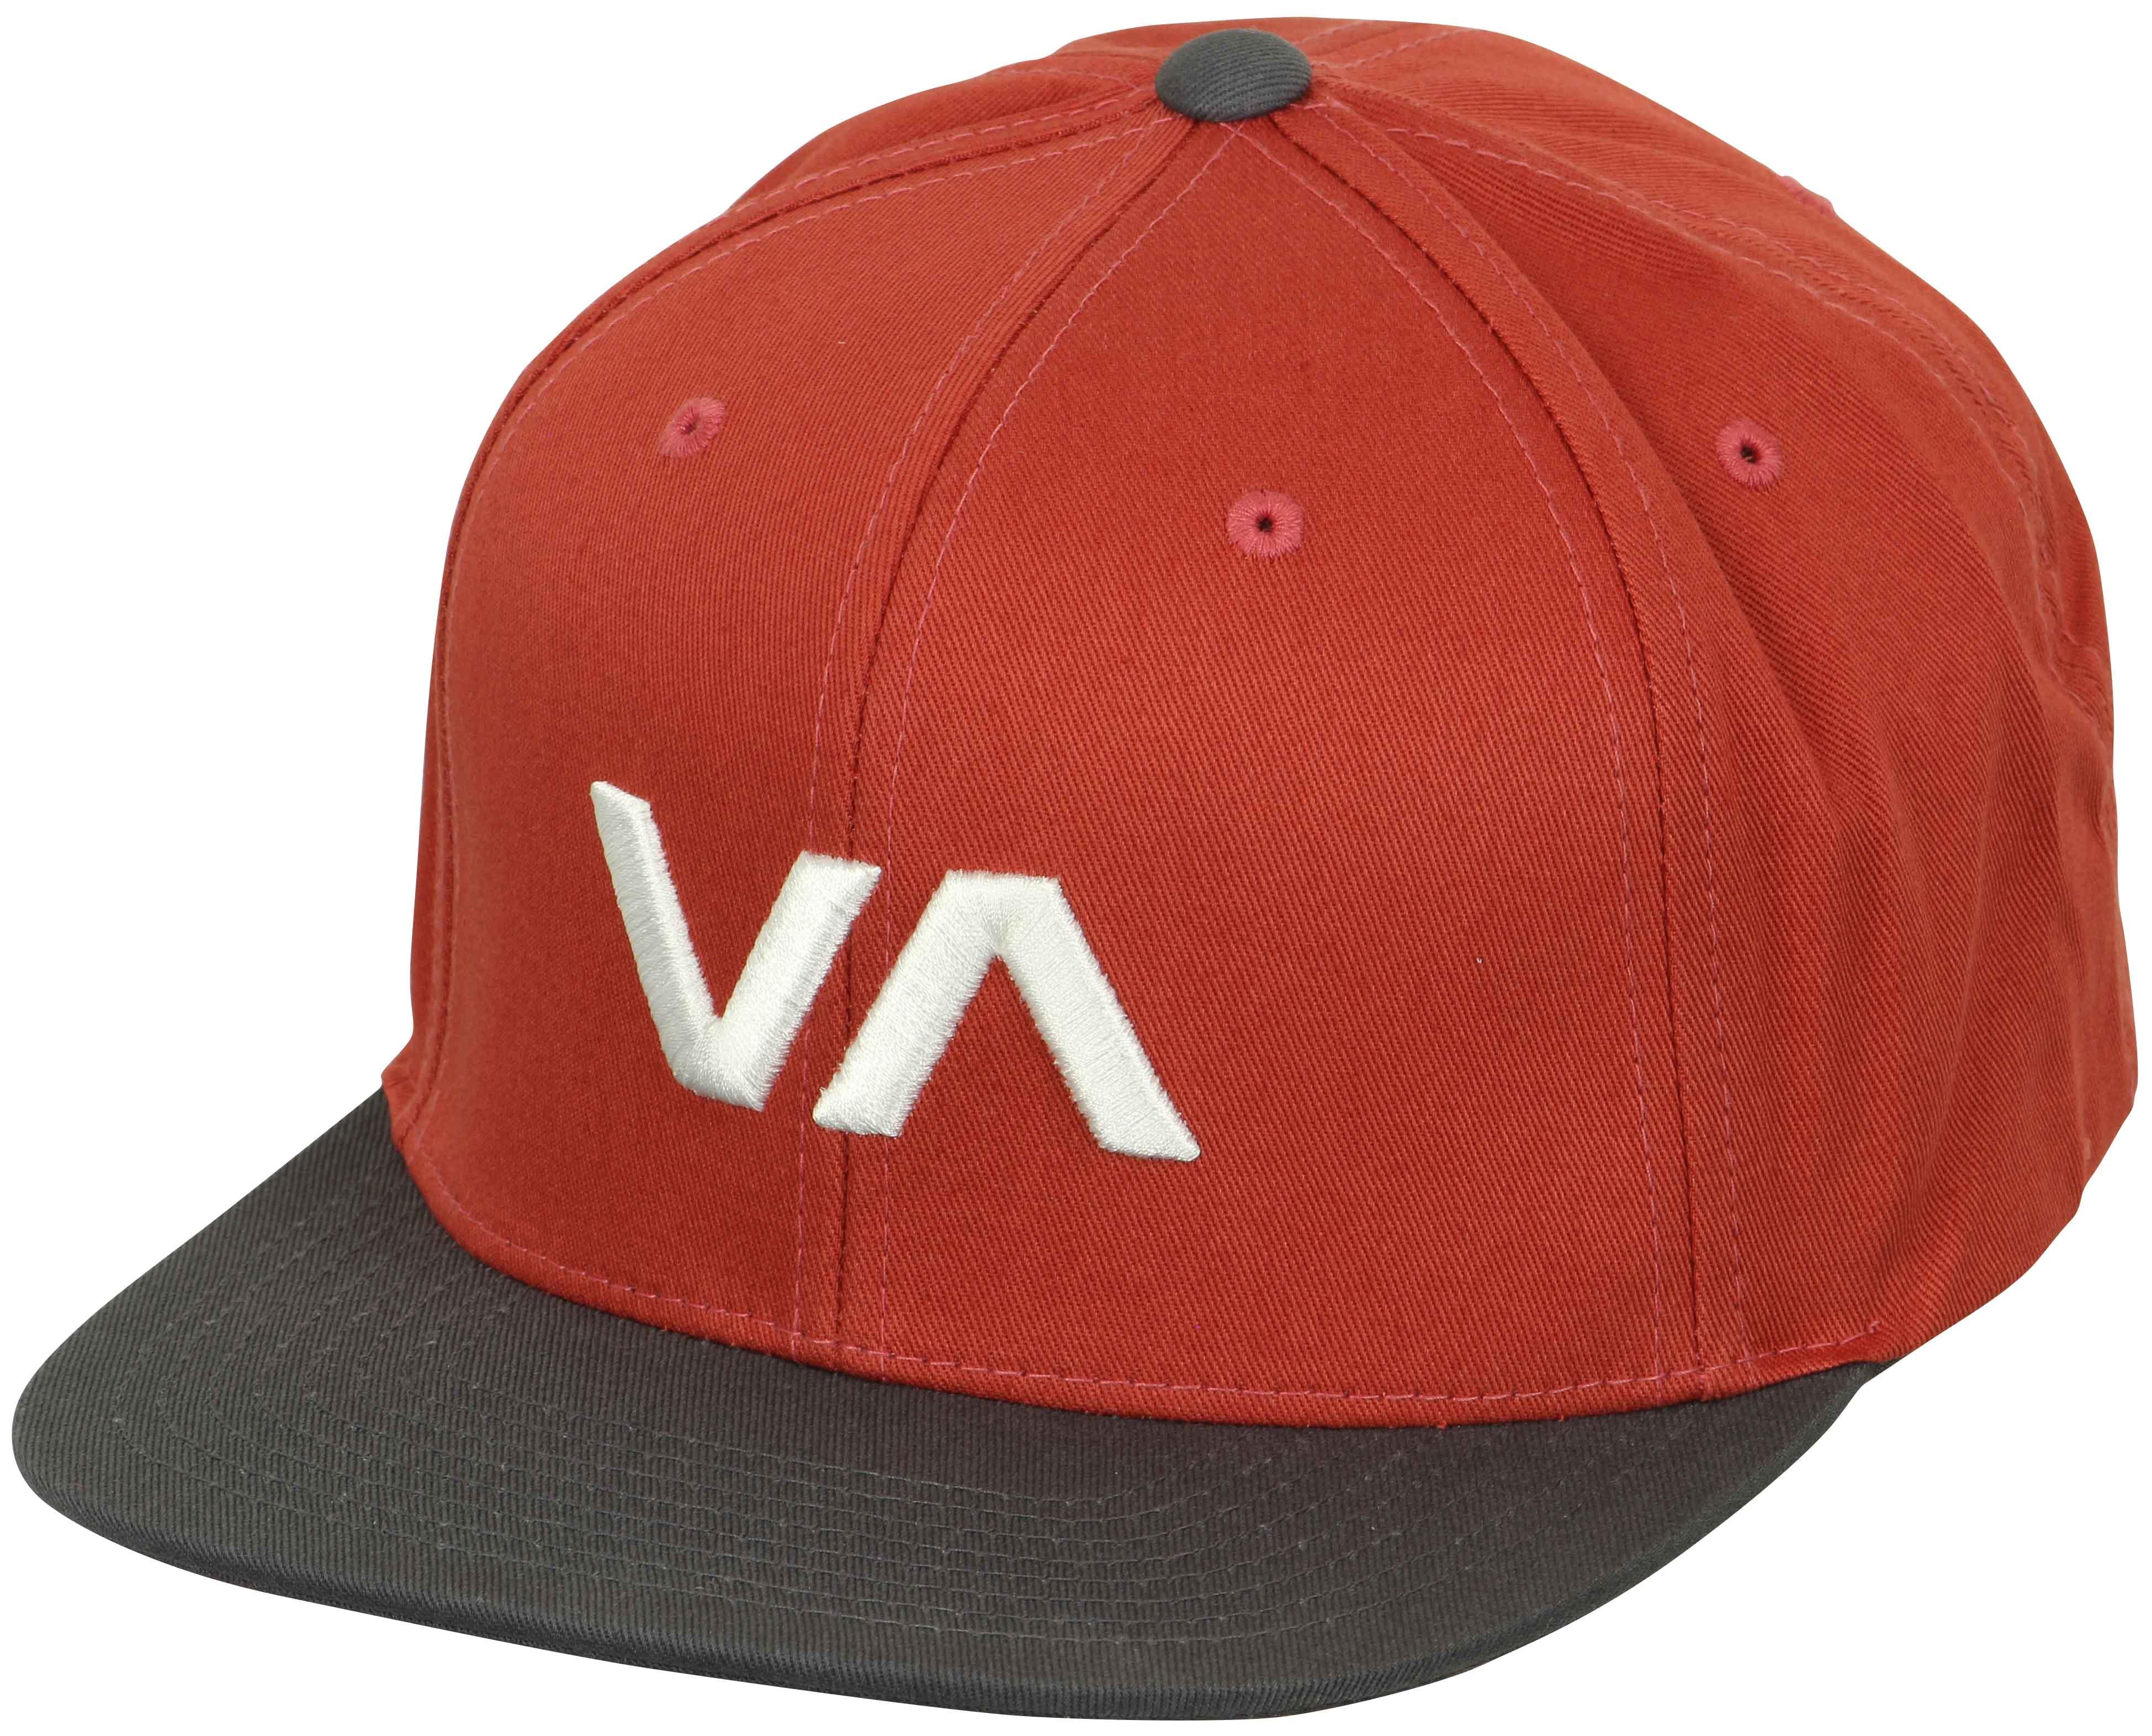 50c8040e2e4 Details about RVCA Mens Sport VA Snapback II Hat - Red Gray White